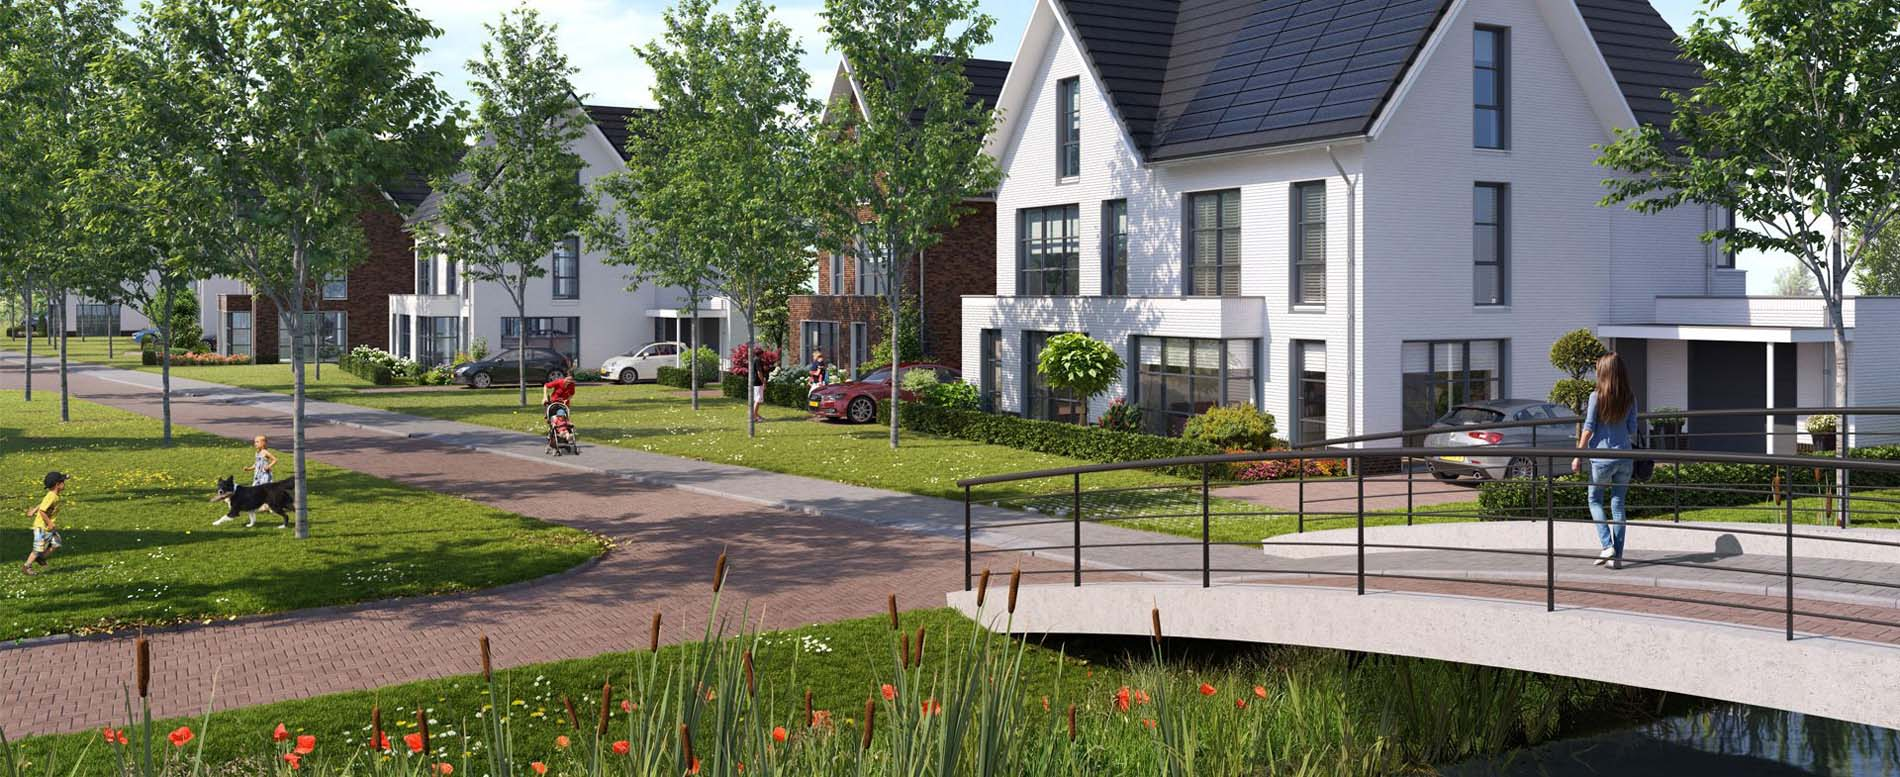 Project - Hervensche Park in 's Hertogenbosch